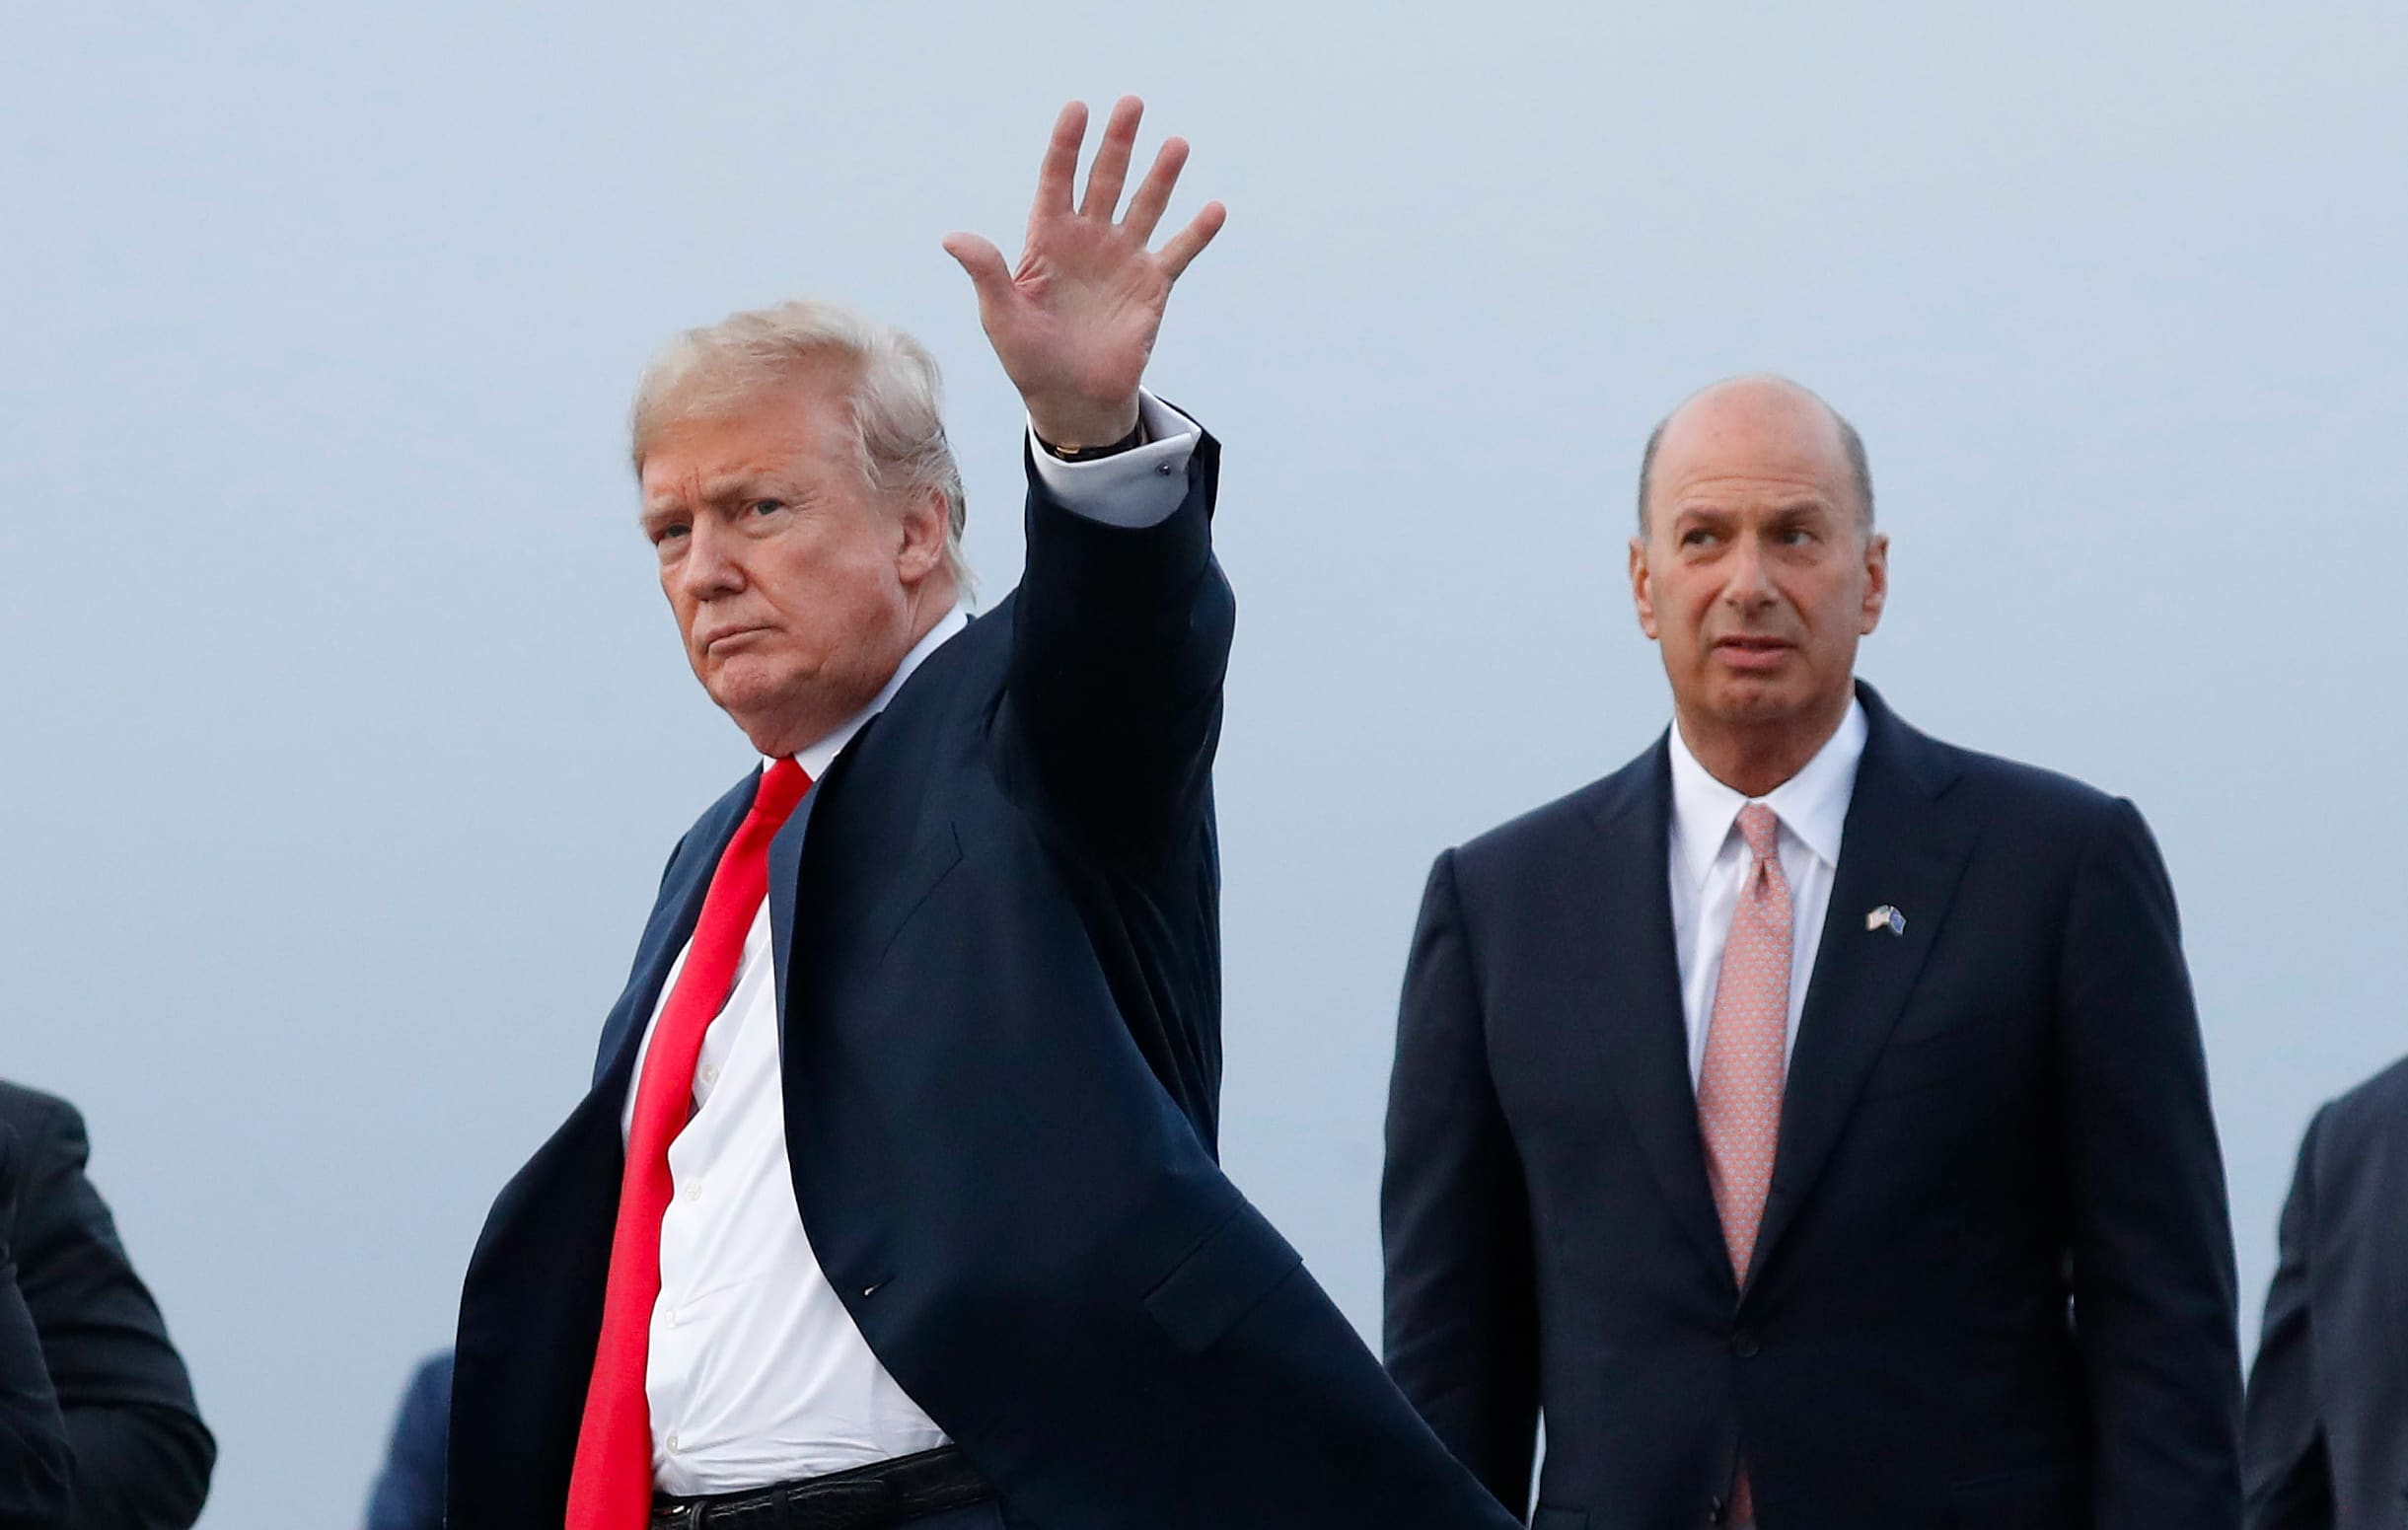 Trump administration blocks key witness Gordon Sondland from testifying in impeachment probe